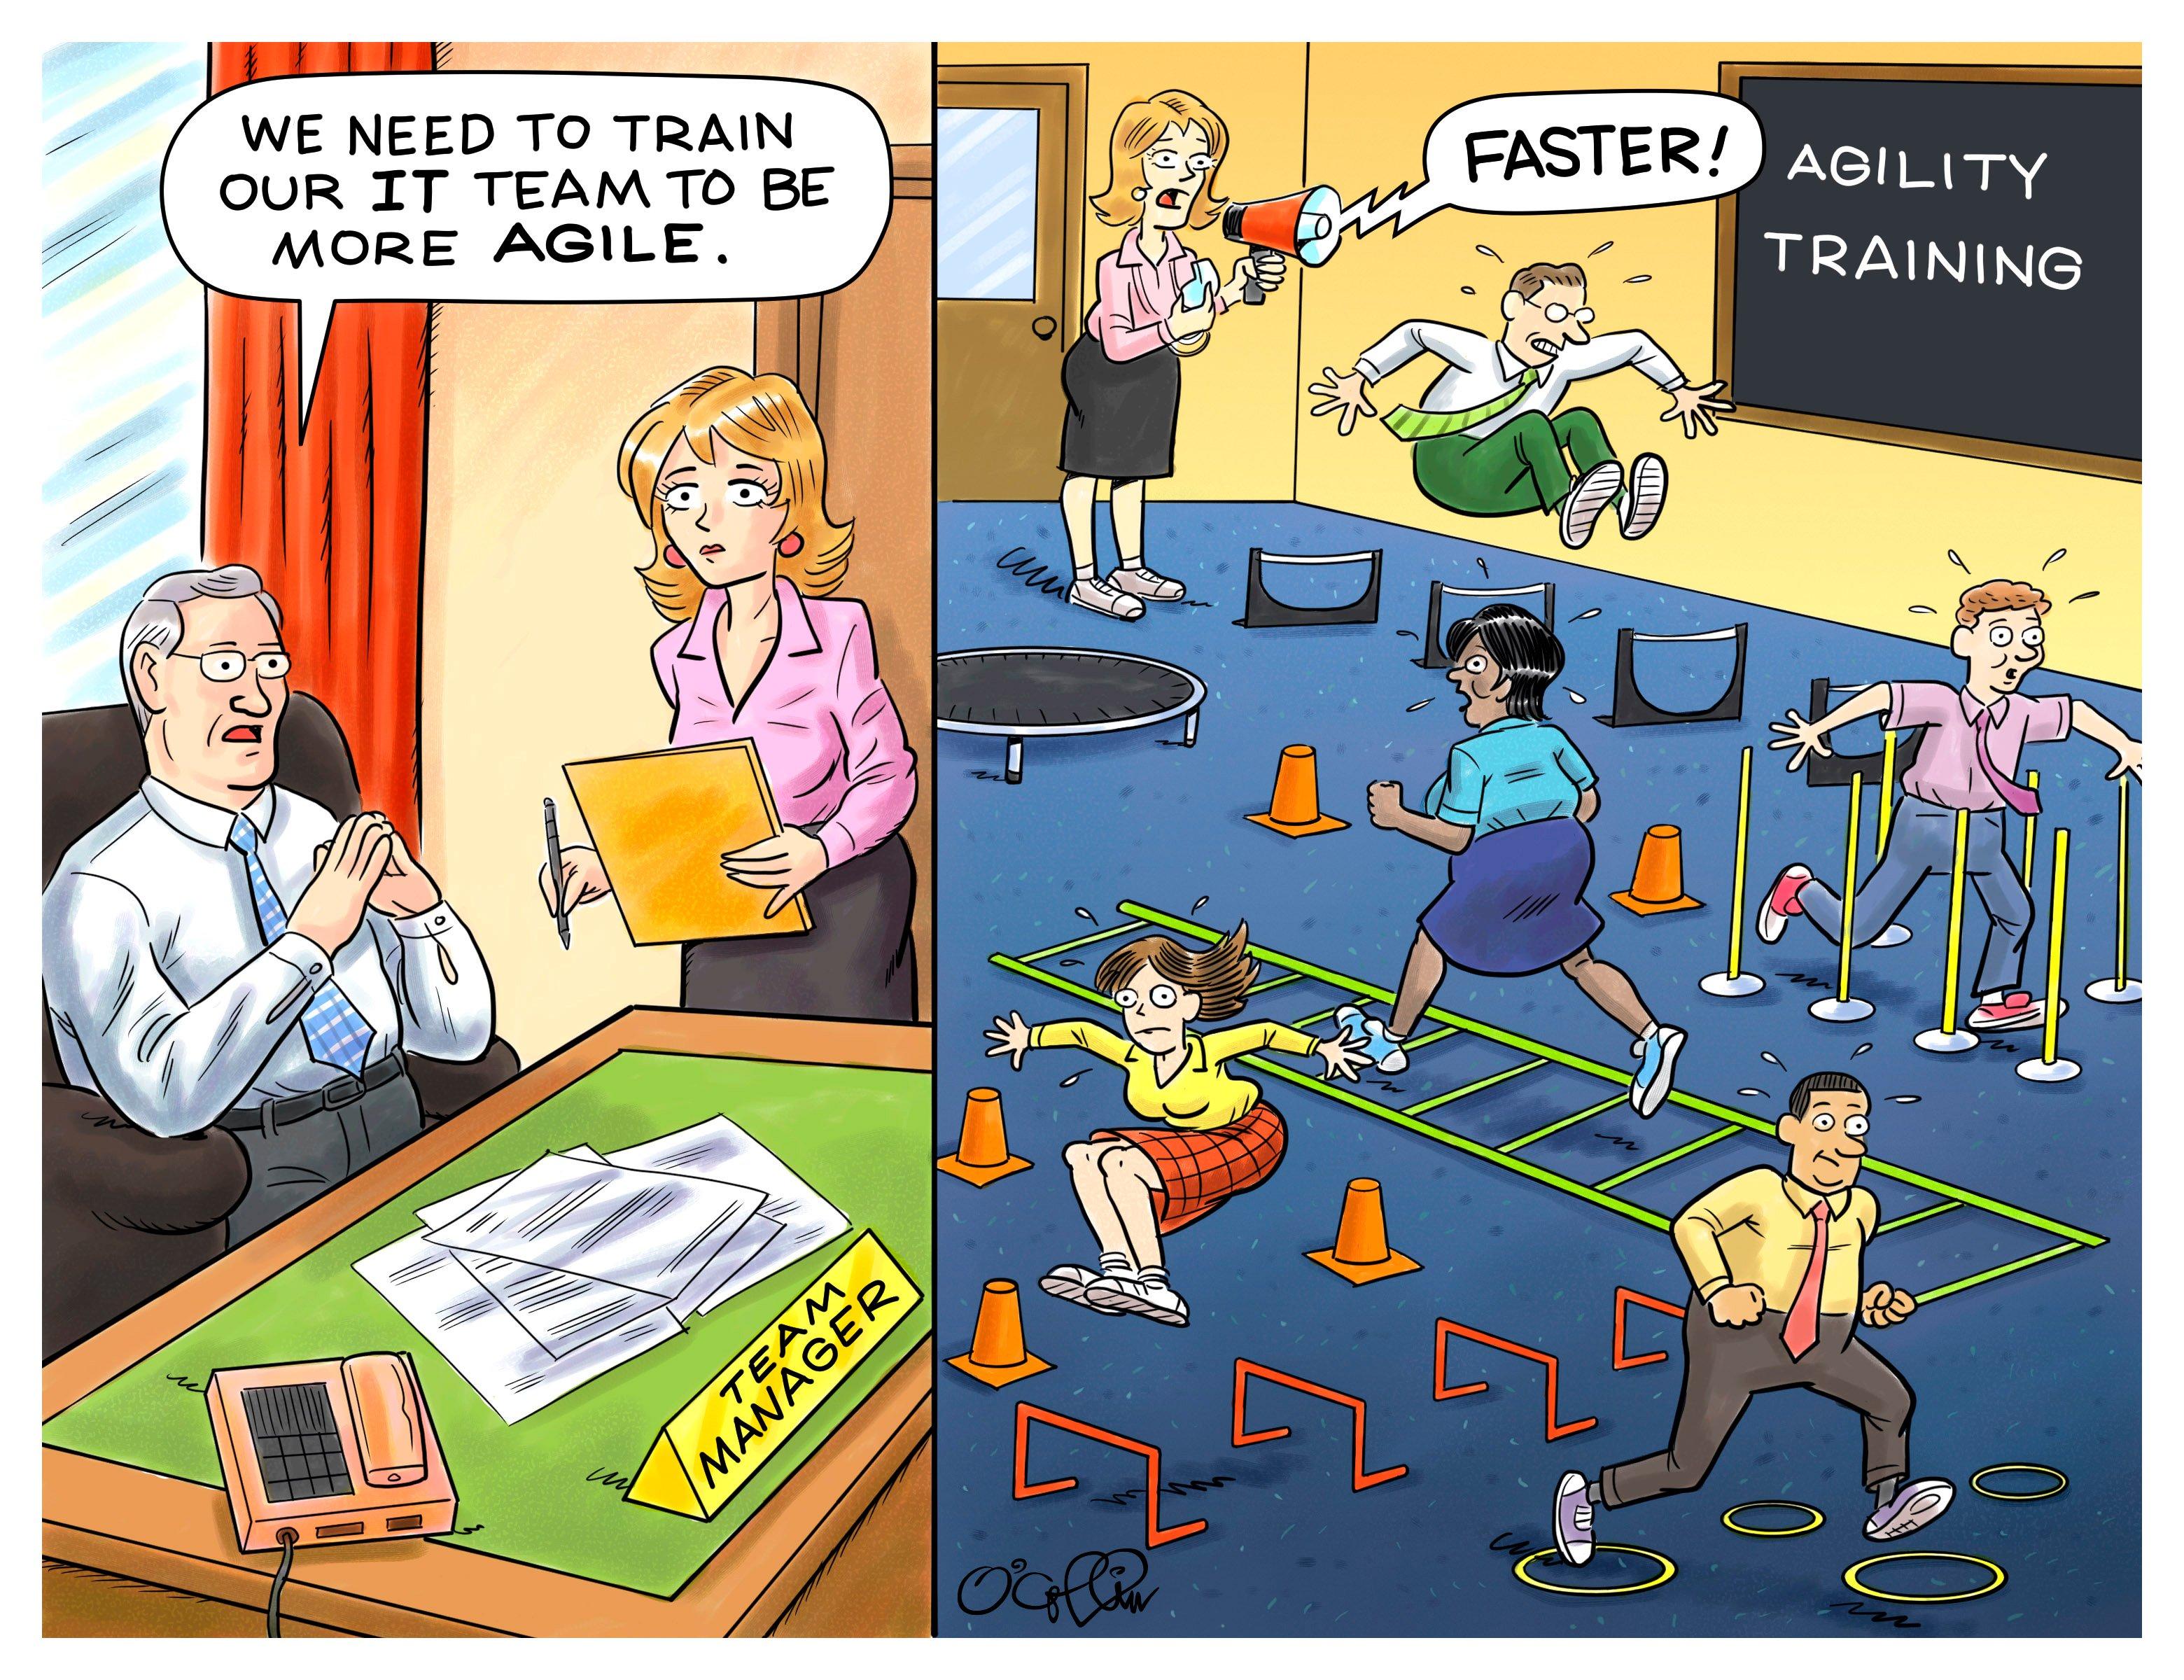 hero-blog-agility-training-cartoon-1920x350